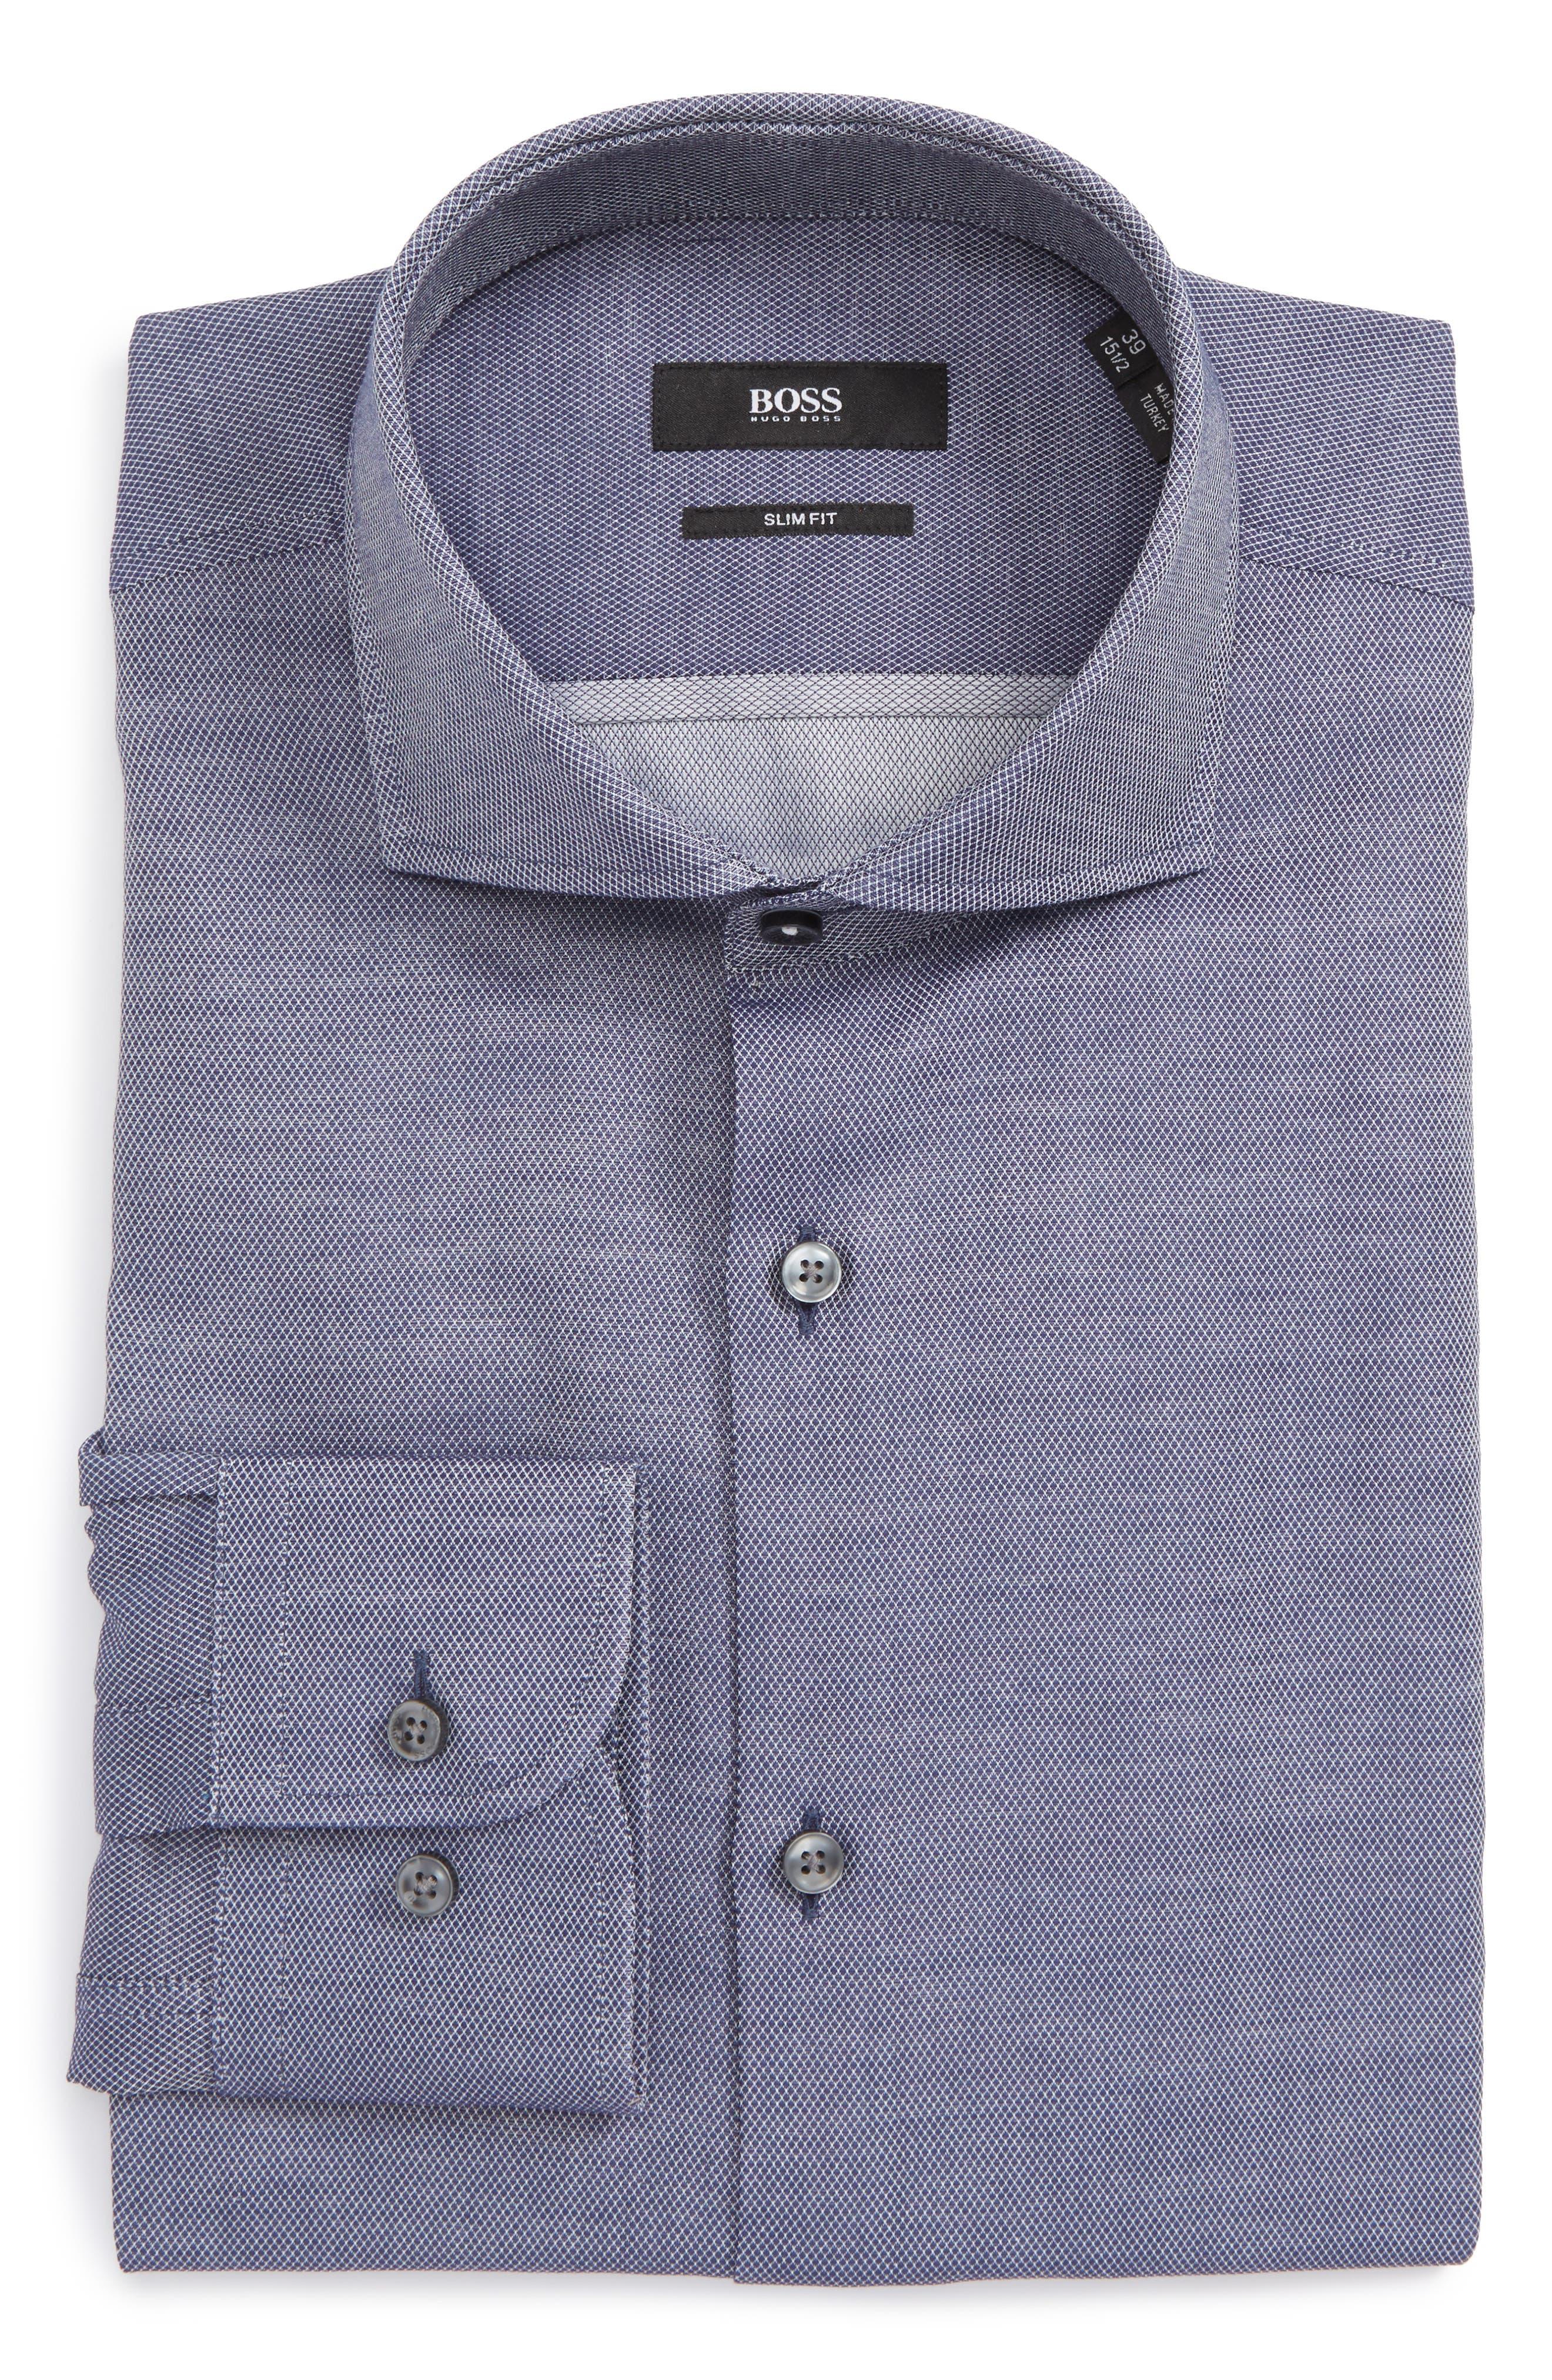 Jerrin Slim Fit Diamond Dress Shirt,                             Main thumbnail 1, color,                             Navy